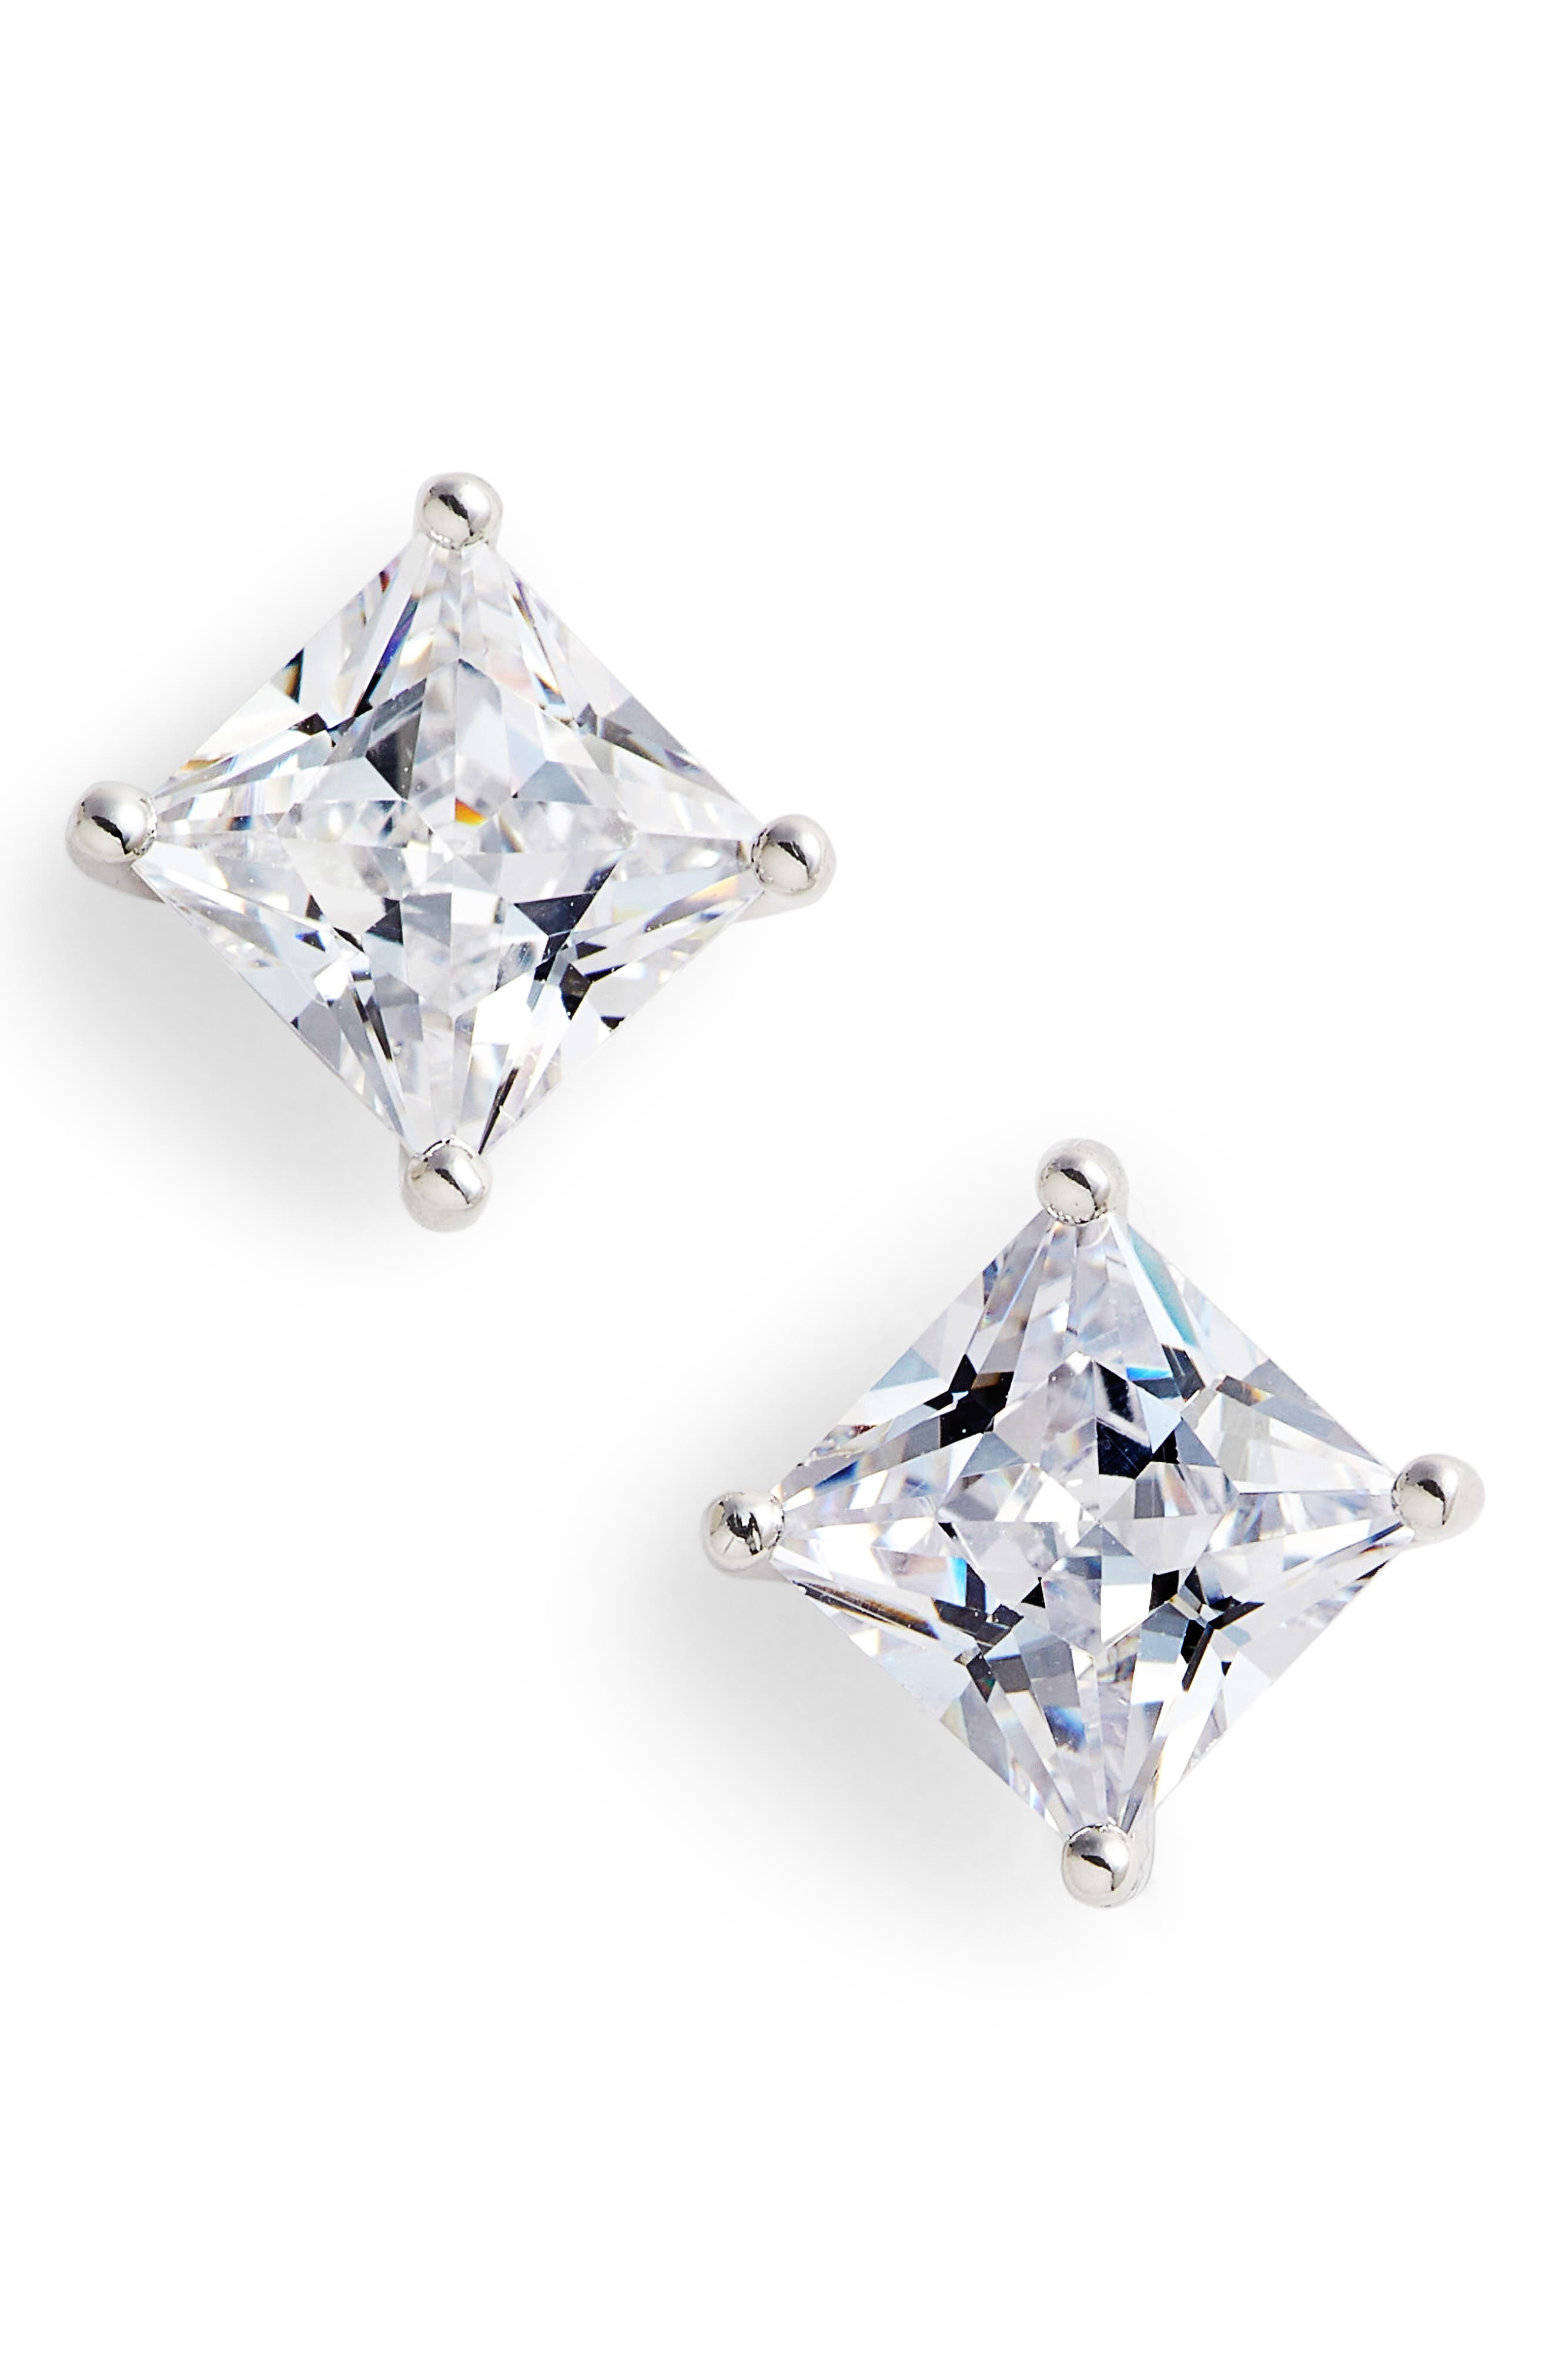 4ct tw Princess Cut Cubic Zirconia Stud Earrings,                         Main,                         color, 040